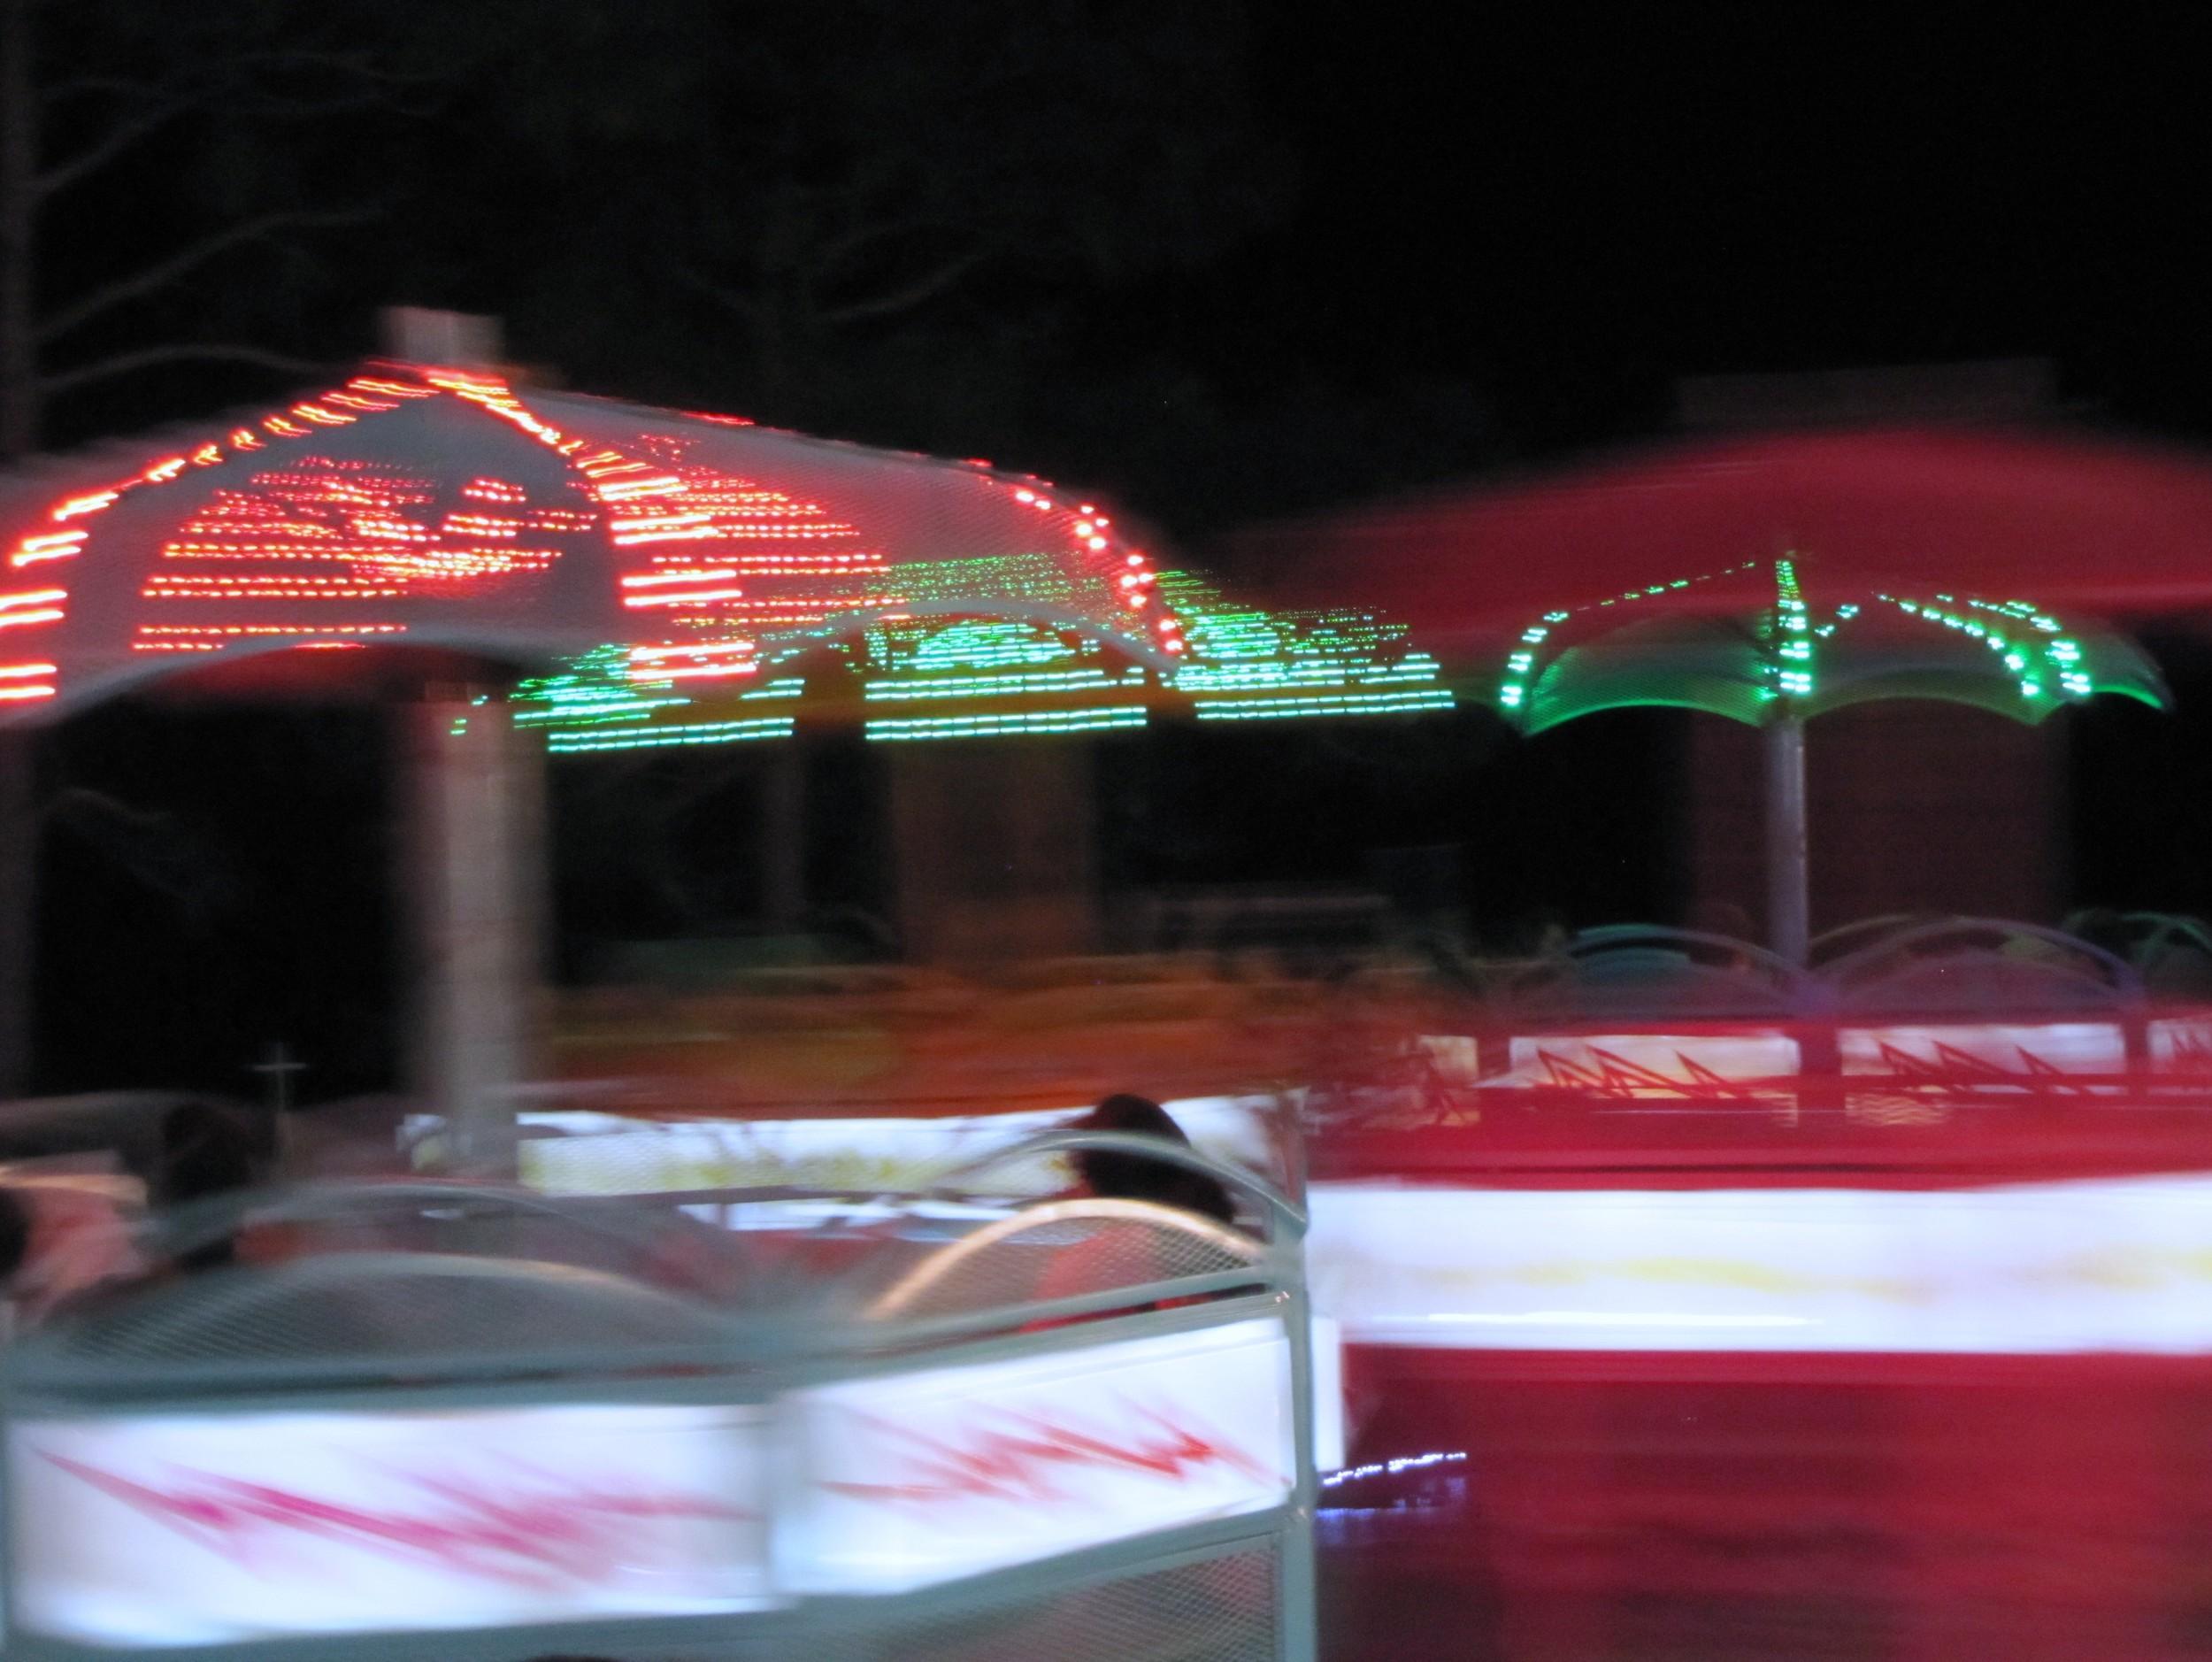 gigi reinette - carnival ride paradise amusements spinning umbrellas